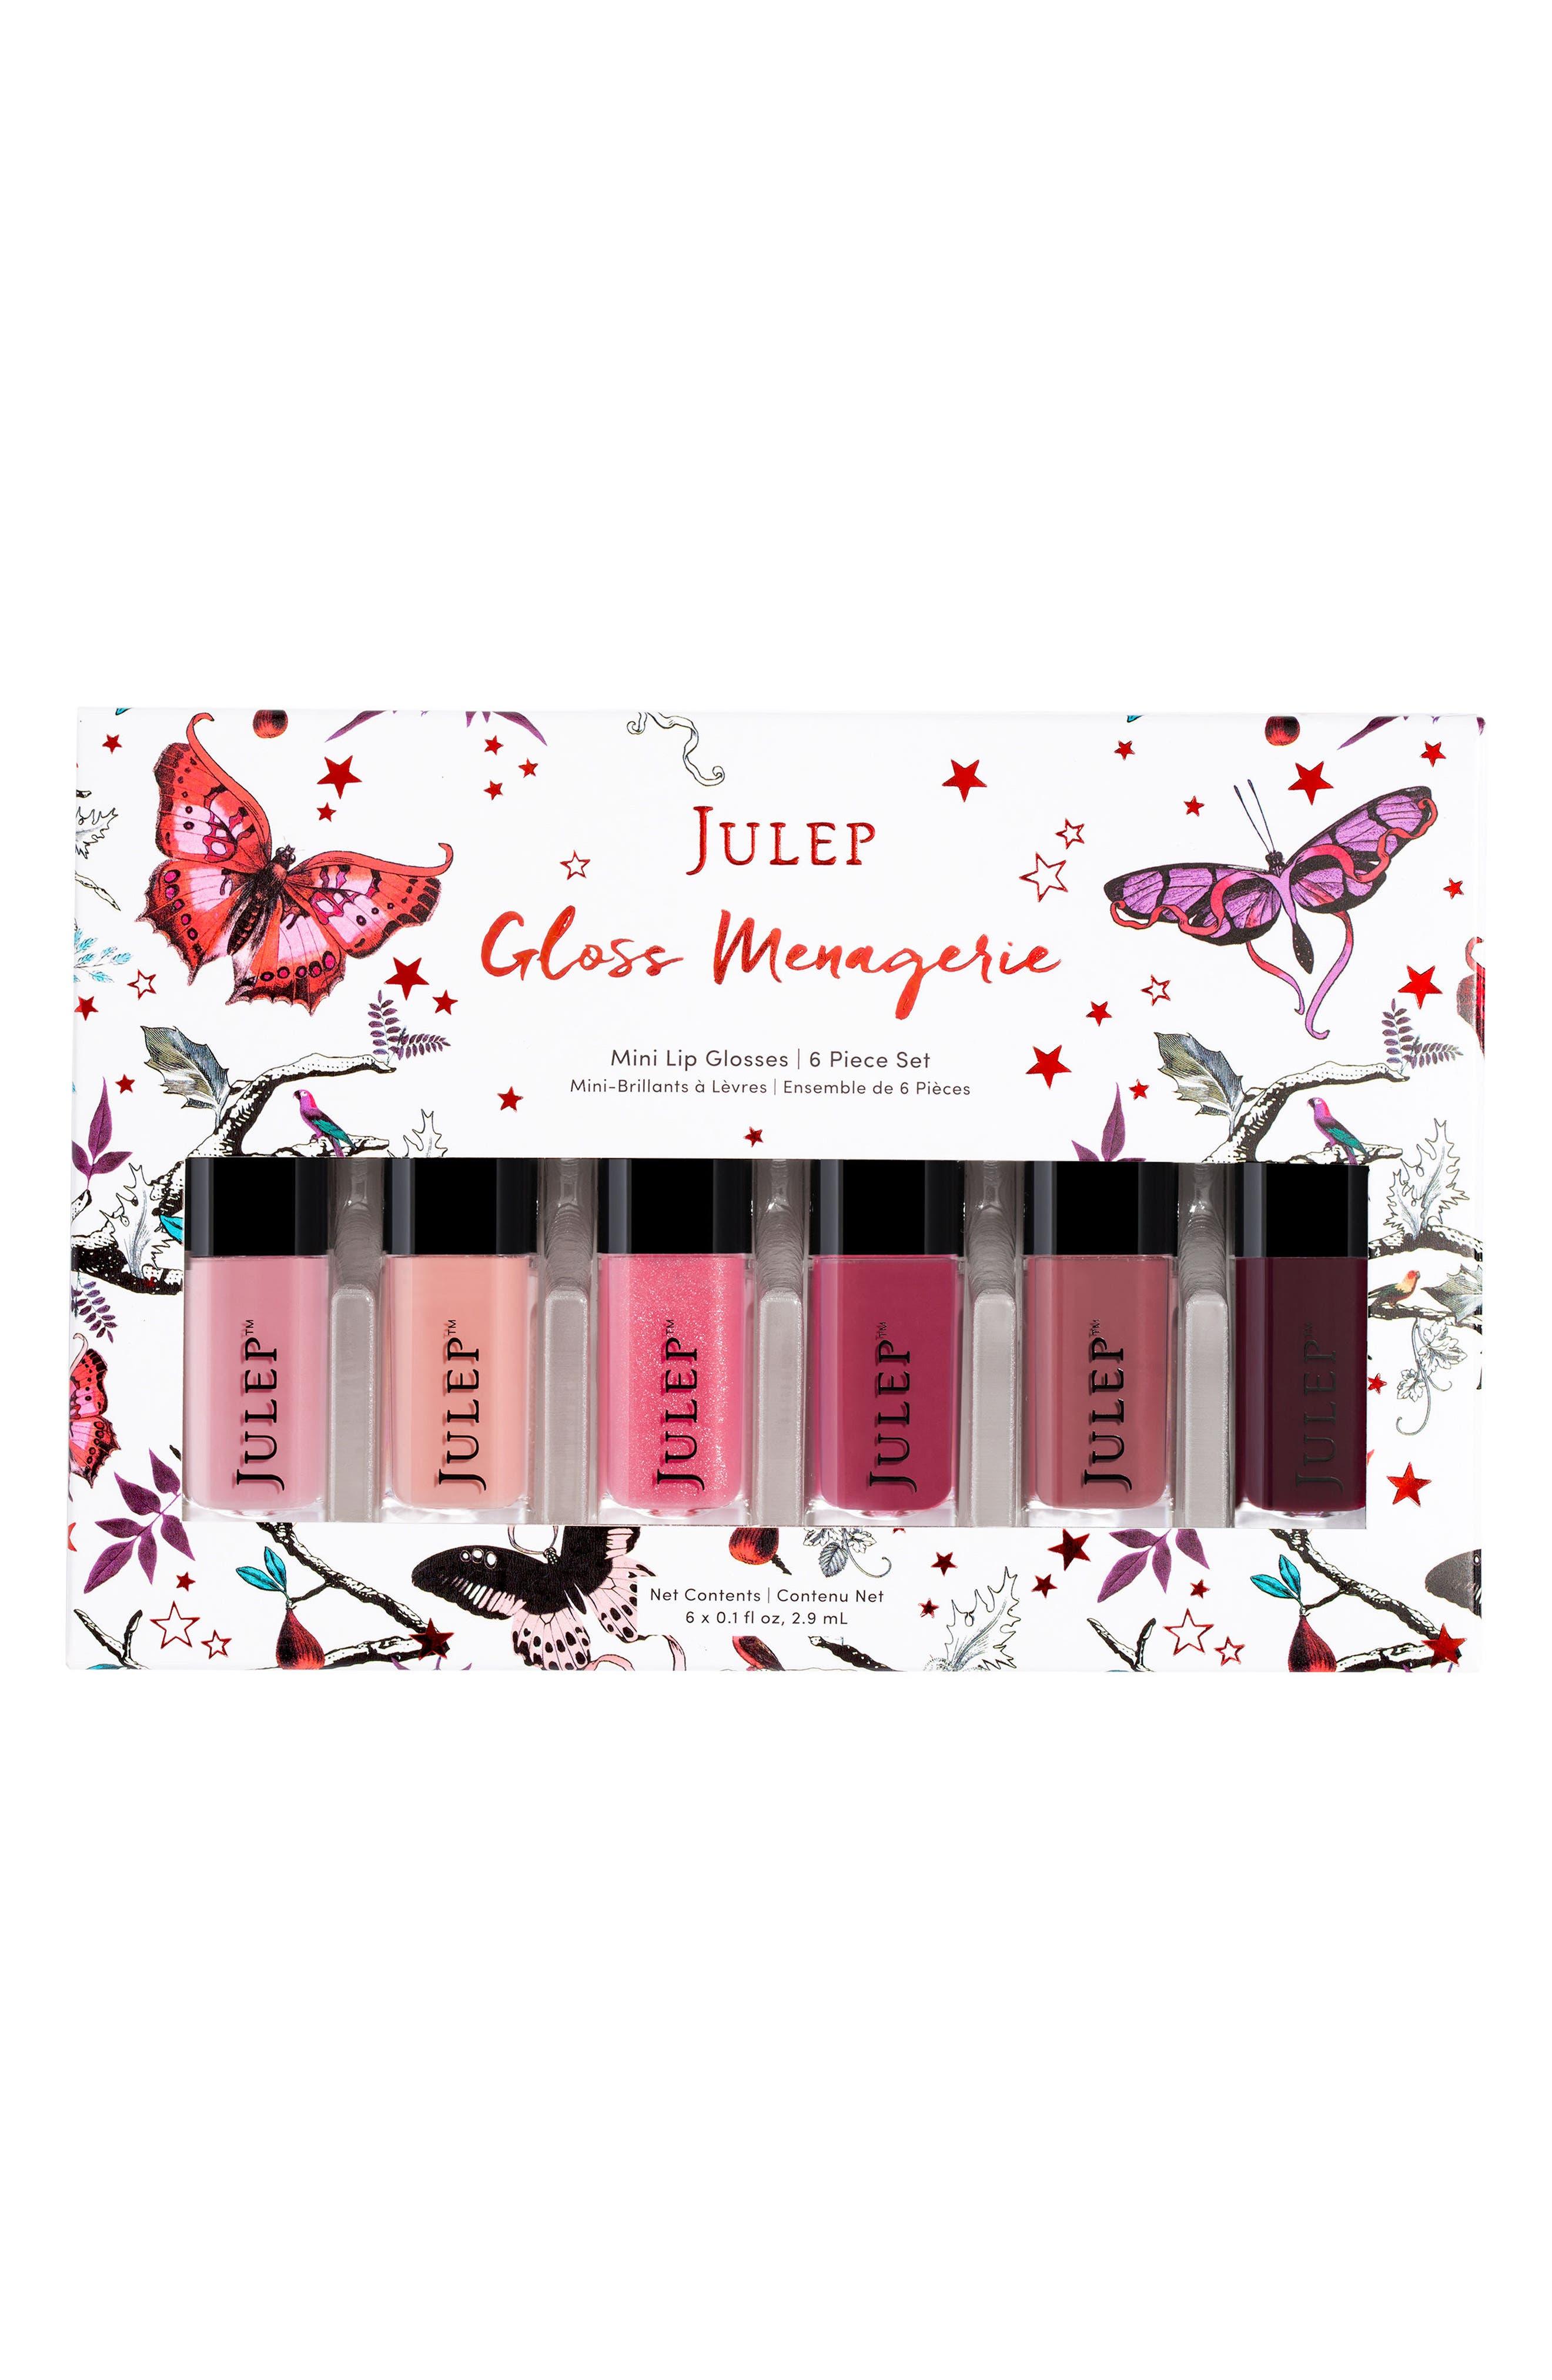 Julep<sup>™</sup> Gloss Menagerie 6-Pack Mini Lip Gloss Set,                             Alternate thumbnail 2, color,                             650